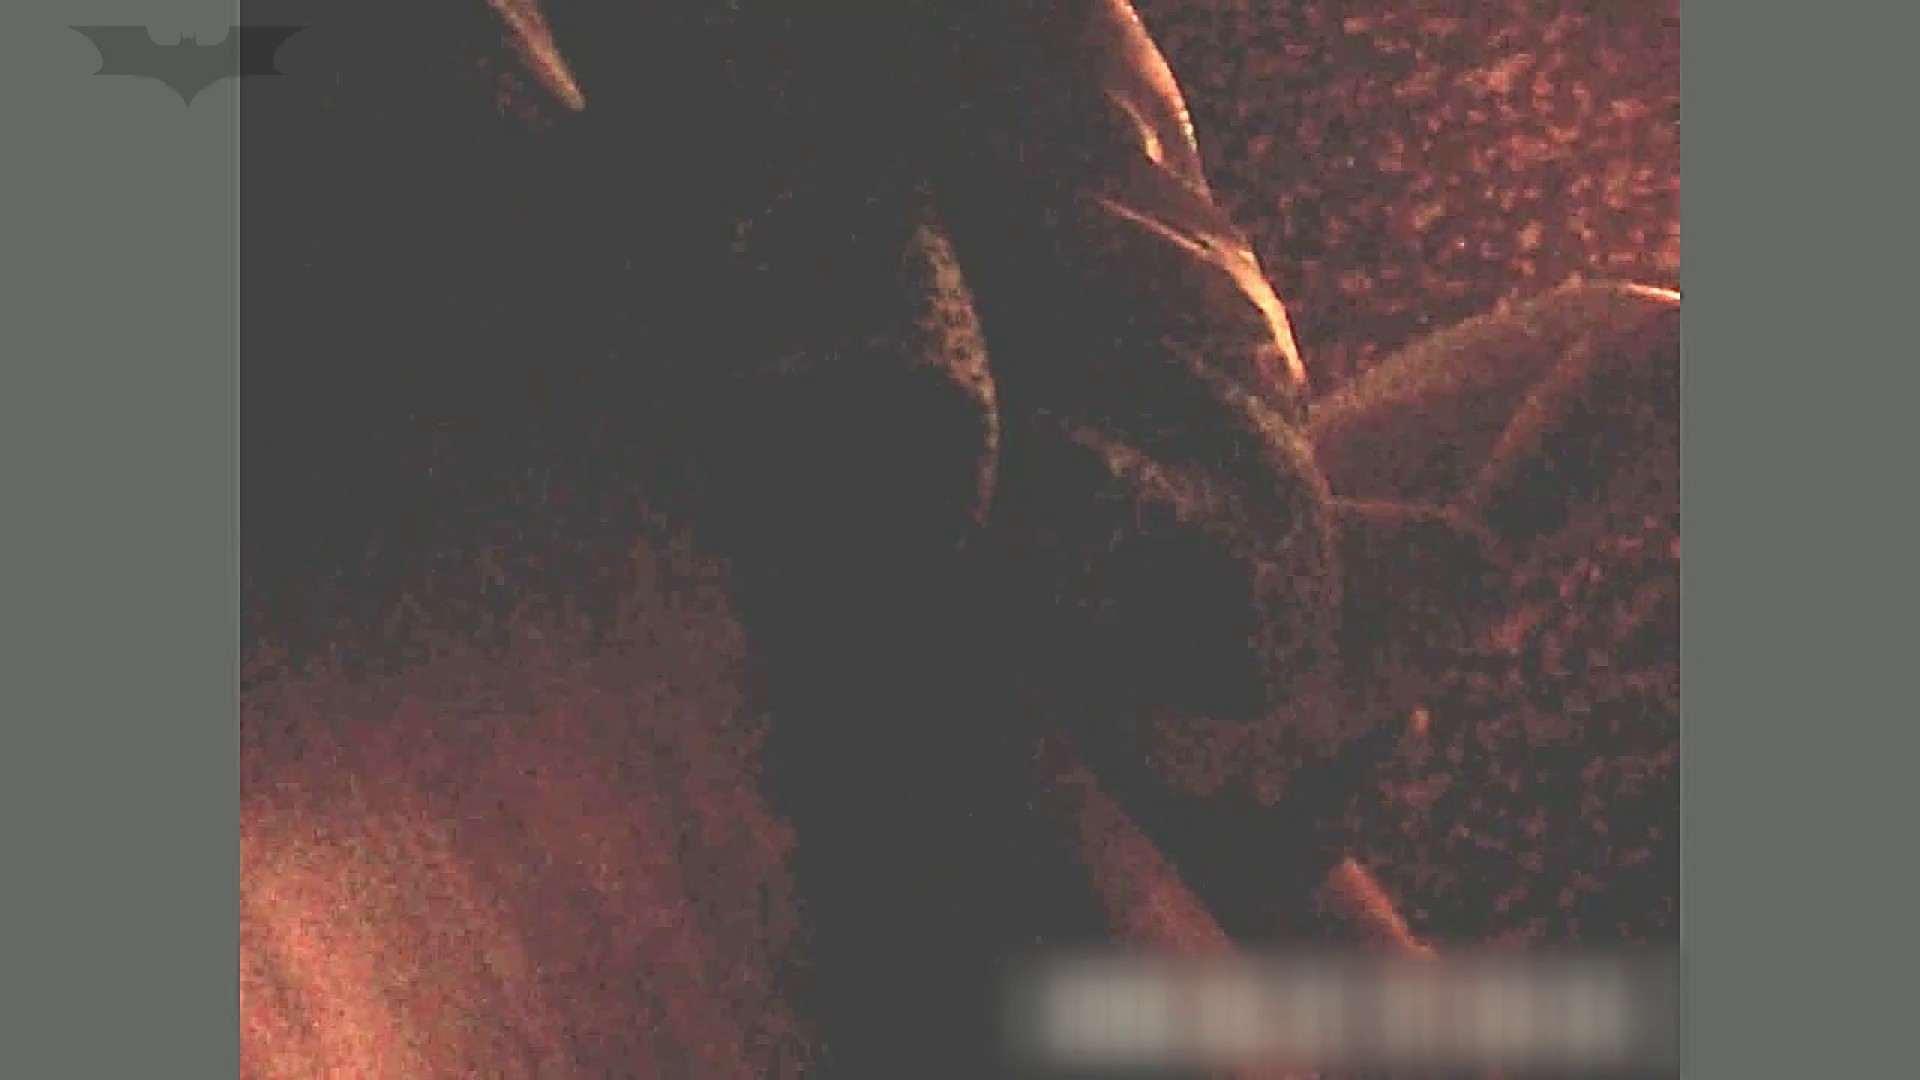 ▲2017_05位▲ 学園アイドル美人女子大生!❶4人厳選詰合せVol.49 人気作   女子大生  113画像 60